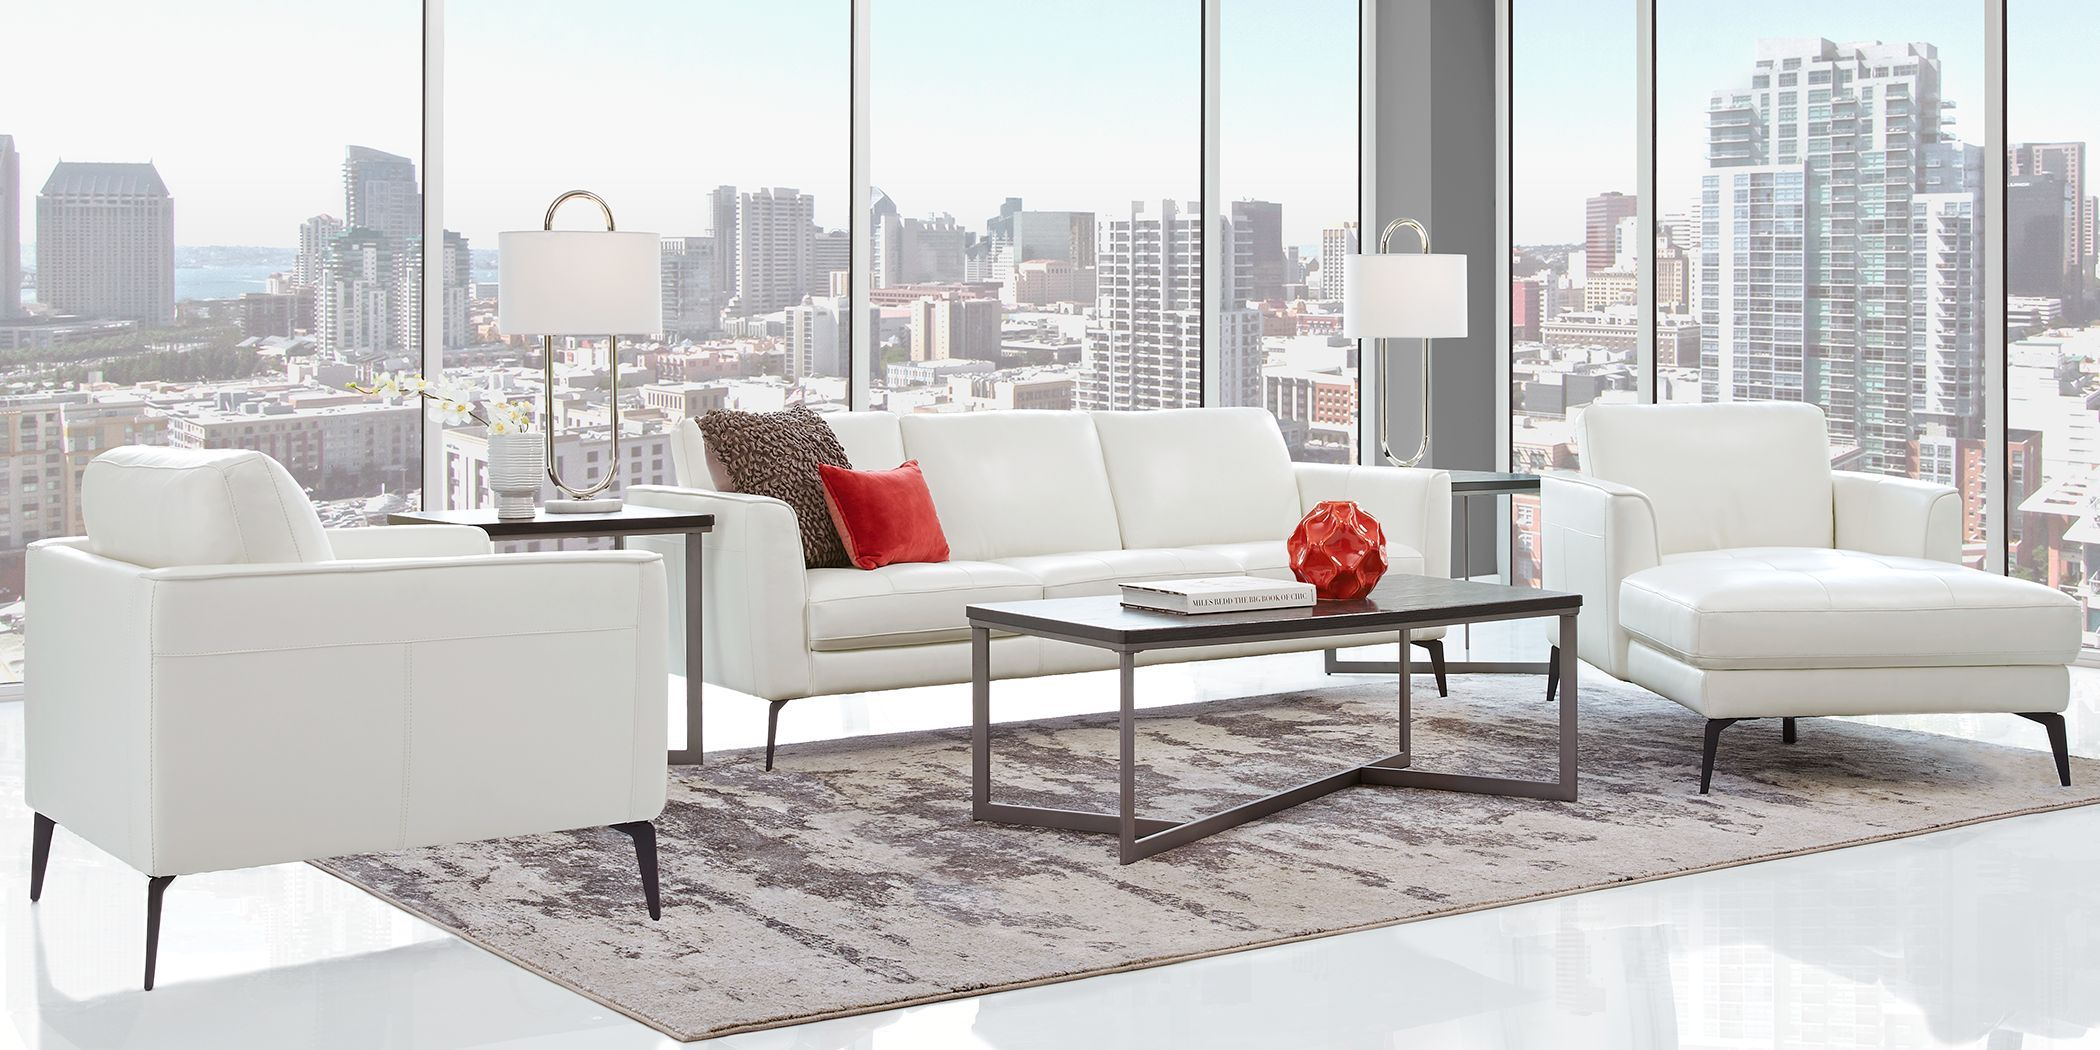 Sofia Vergara Brazil White 5 Pc Leather Living Room Rooms To Go Living Room Sets Furniture Furniture Living Room Leather